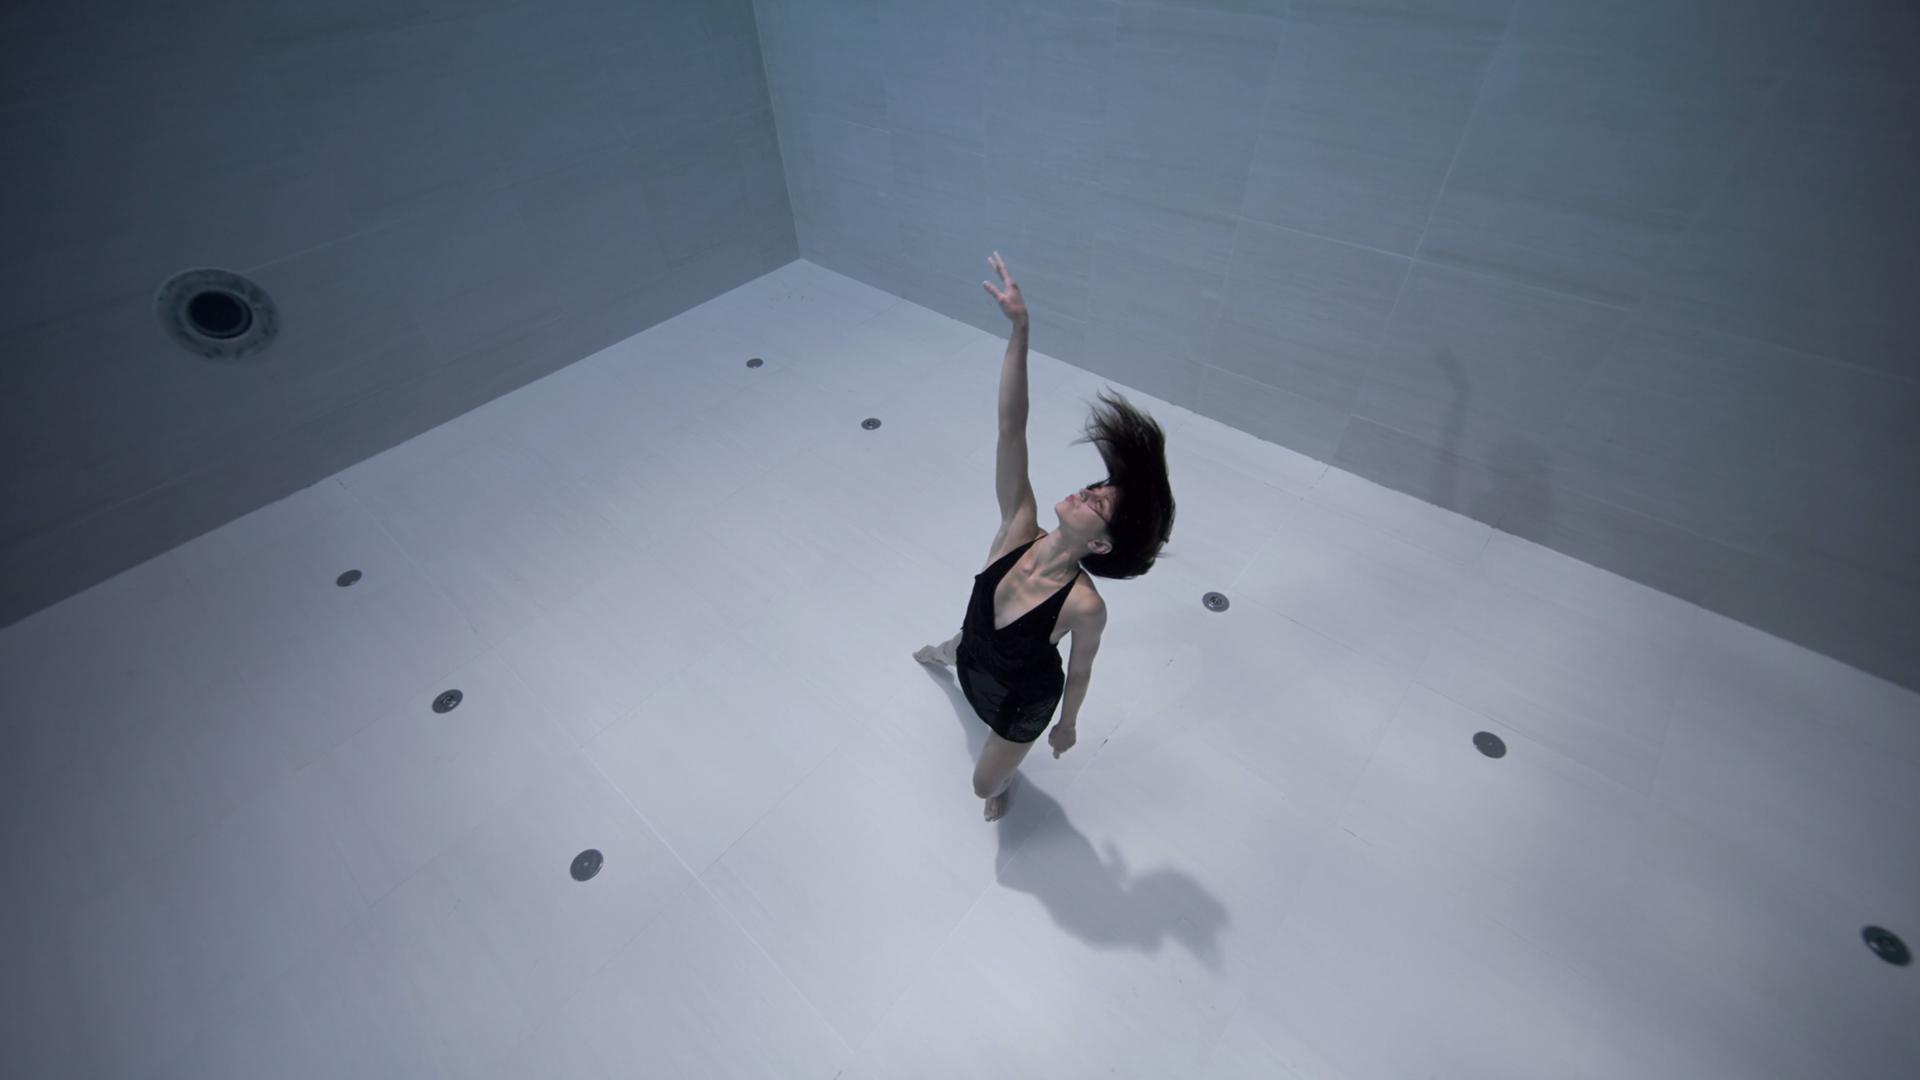 Ama, affascinate danza subacquea di Julie Gautier | Collater.al 4